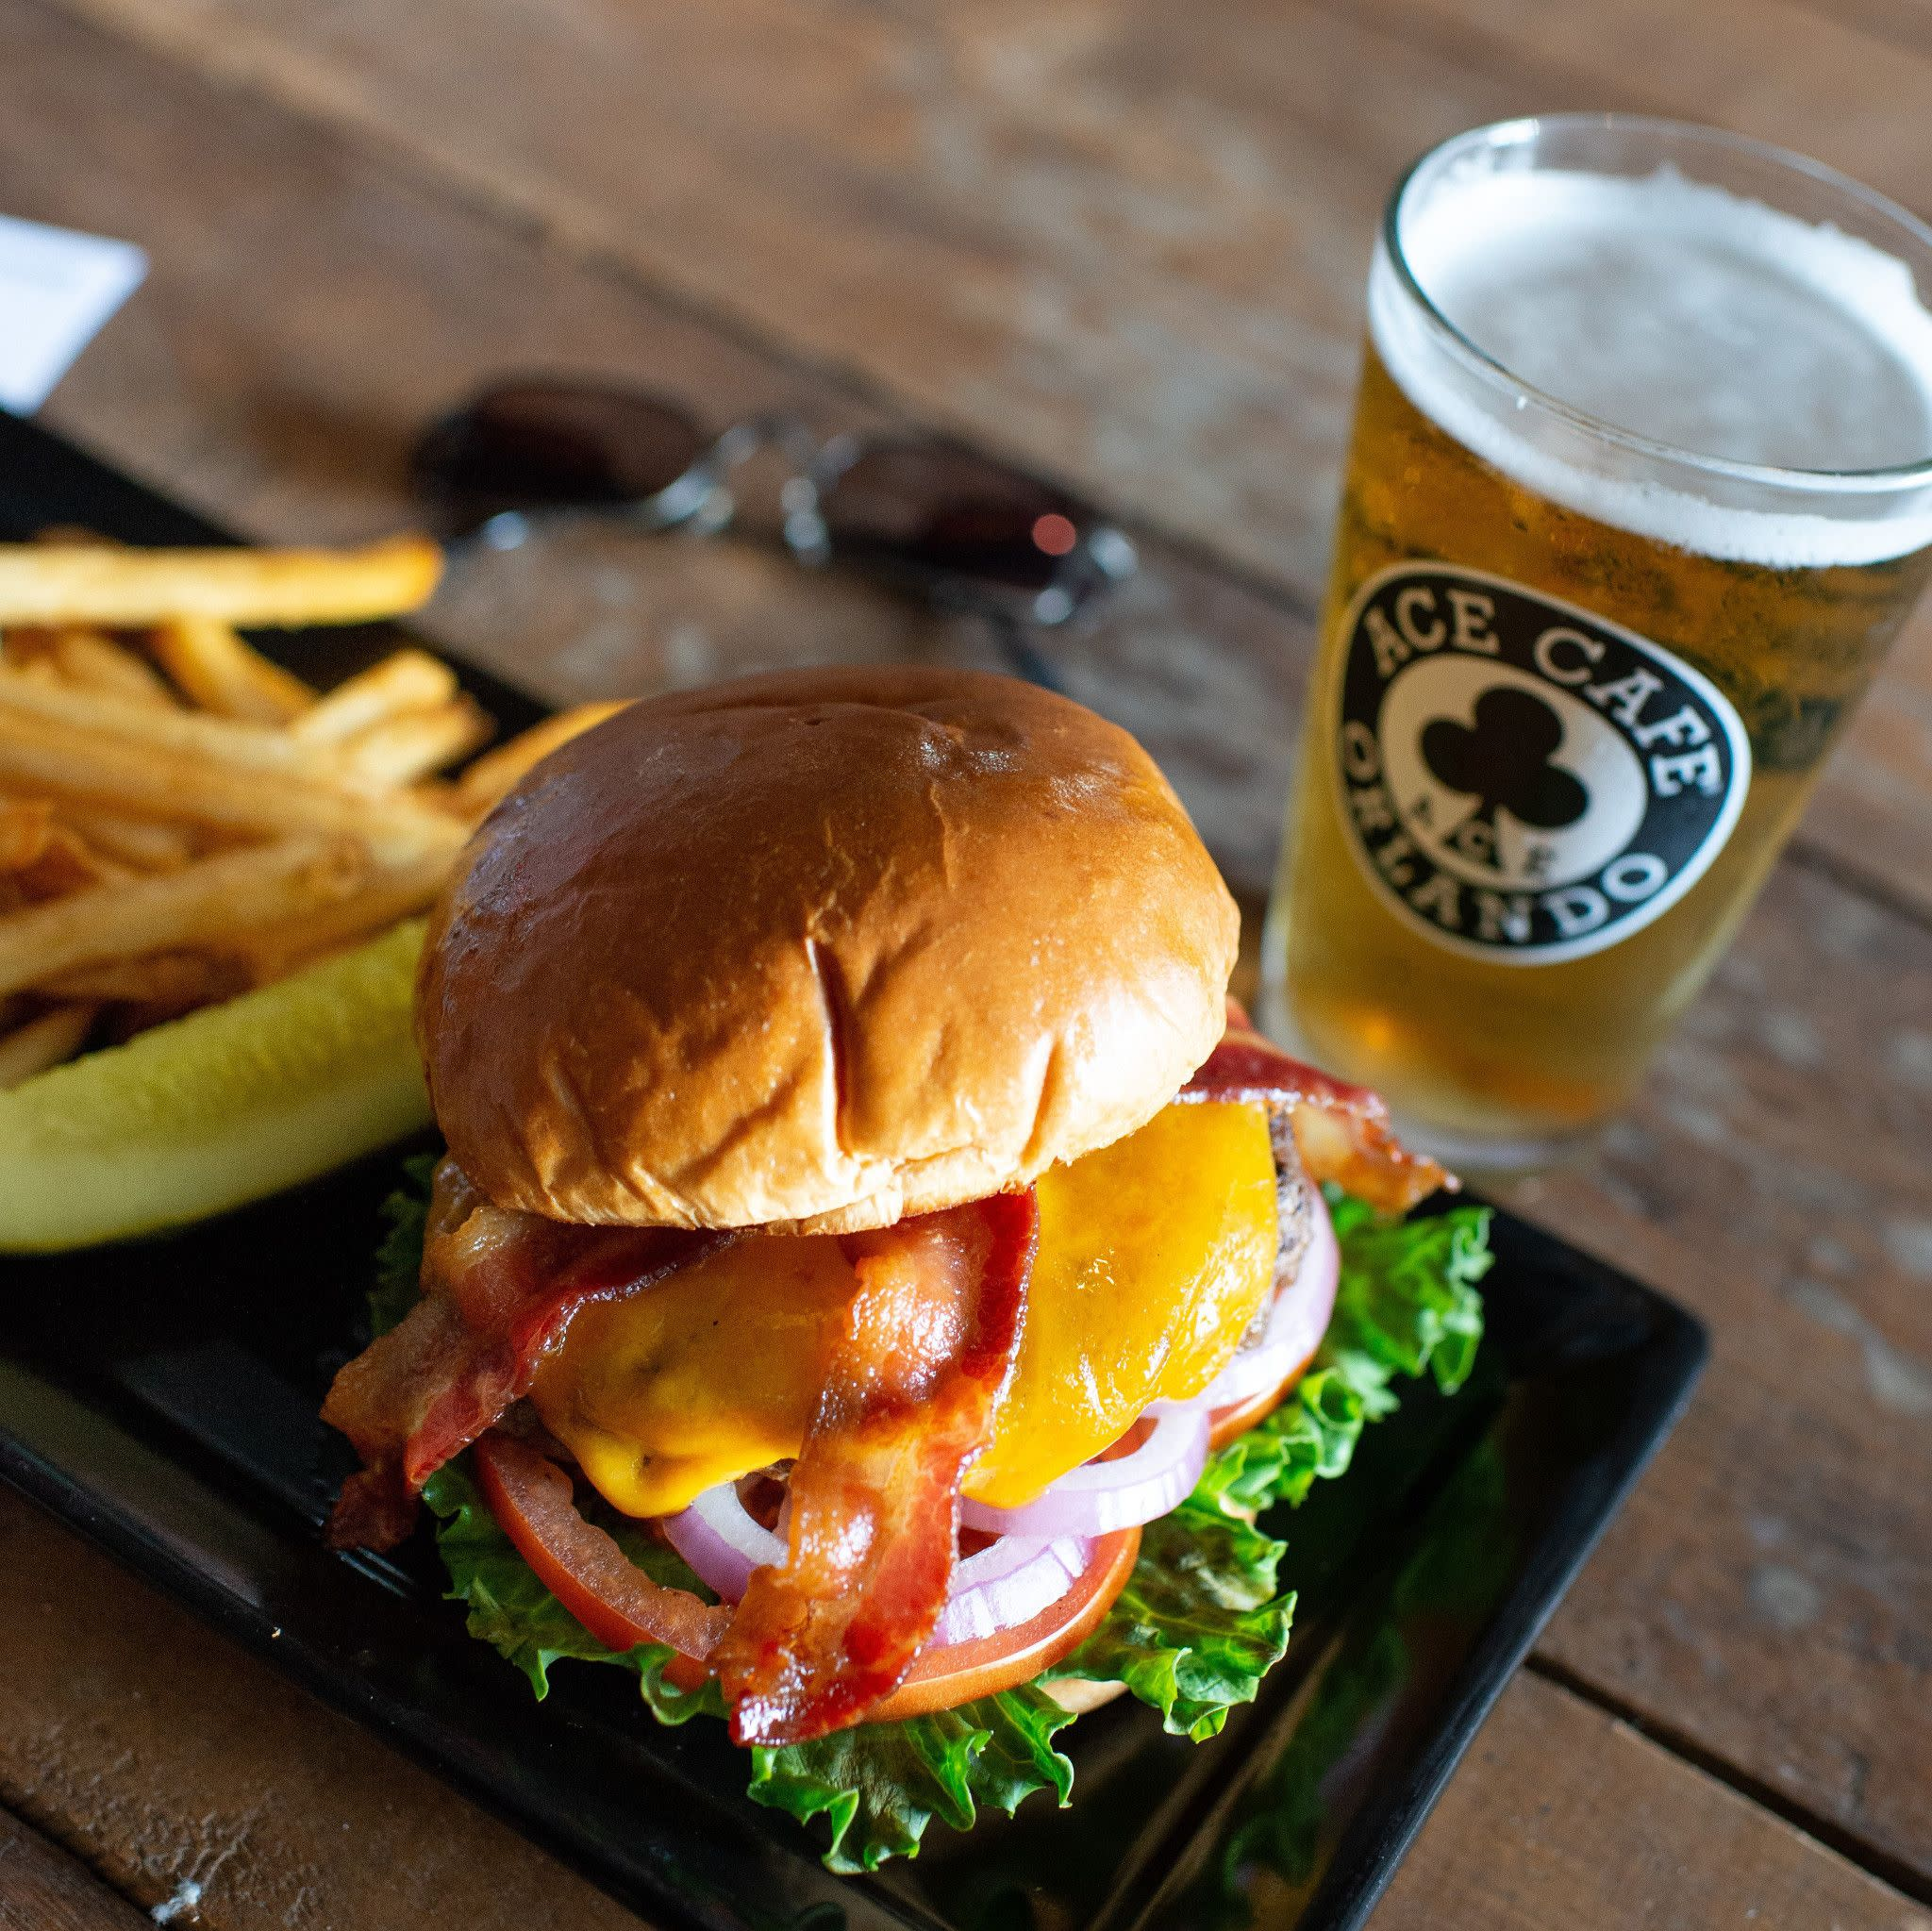 171326_burger.jpg